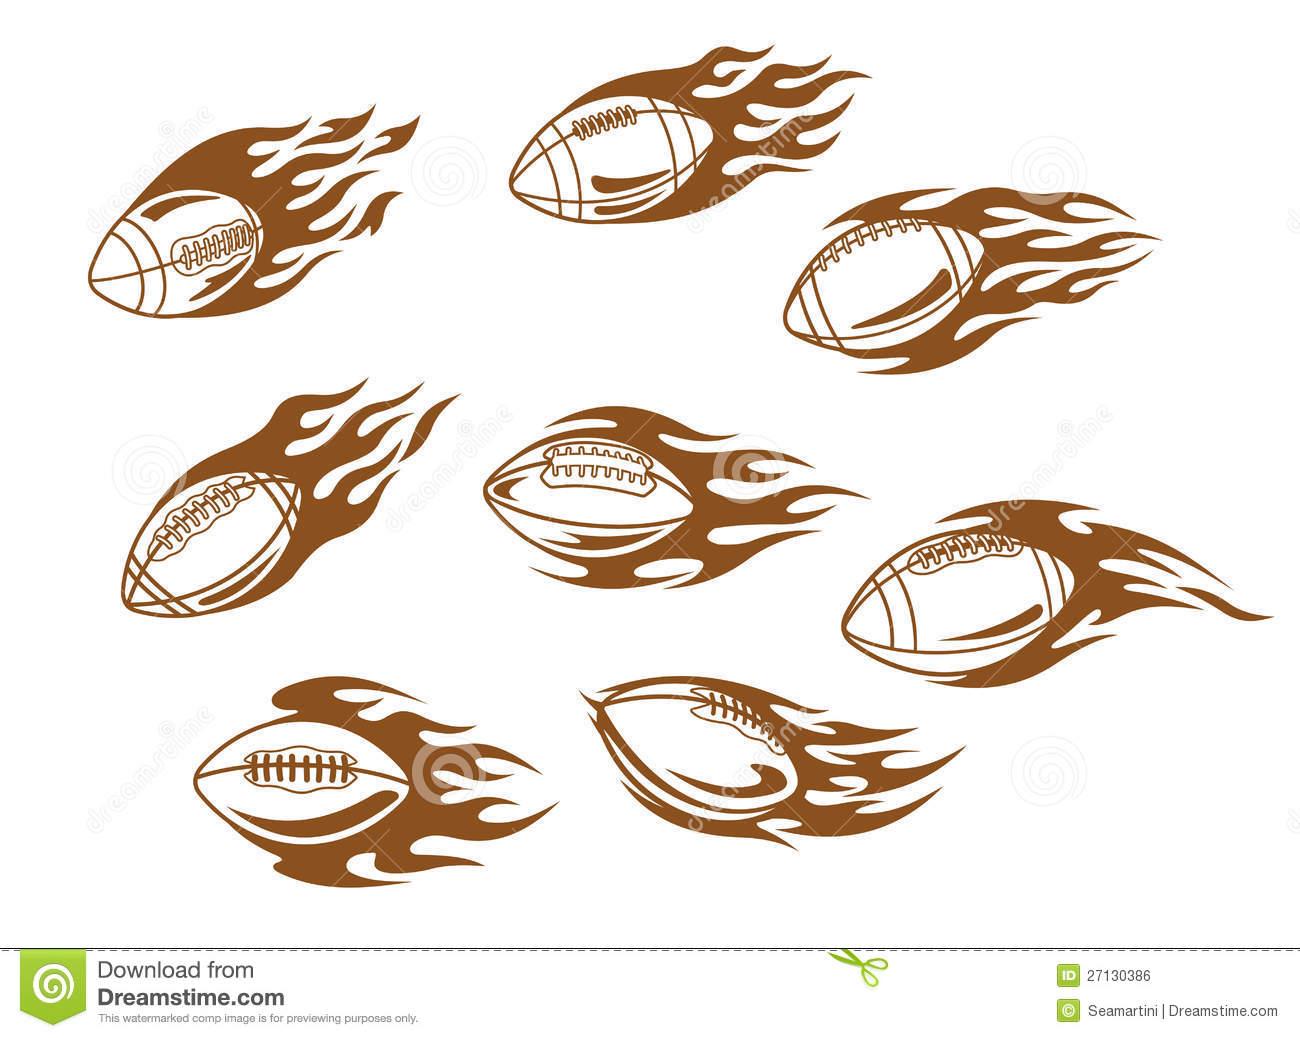 football tattoo images designs. Black Bedroom Furniture Sets. Home Design Ideas